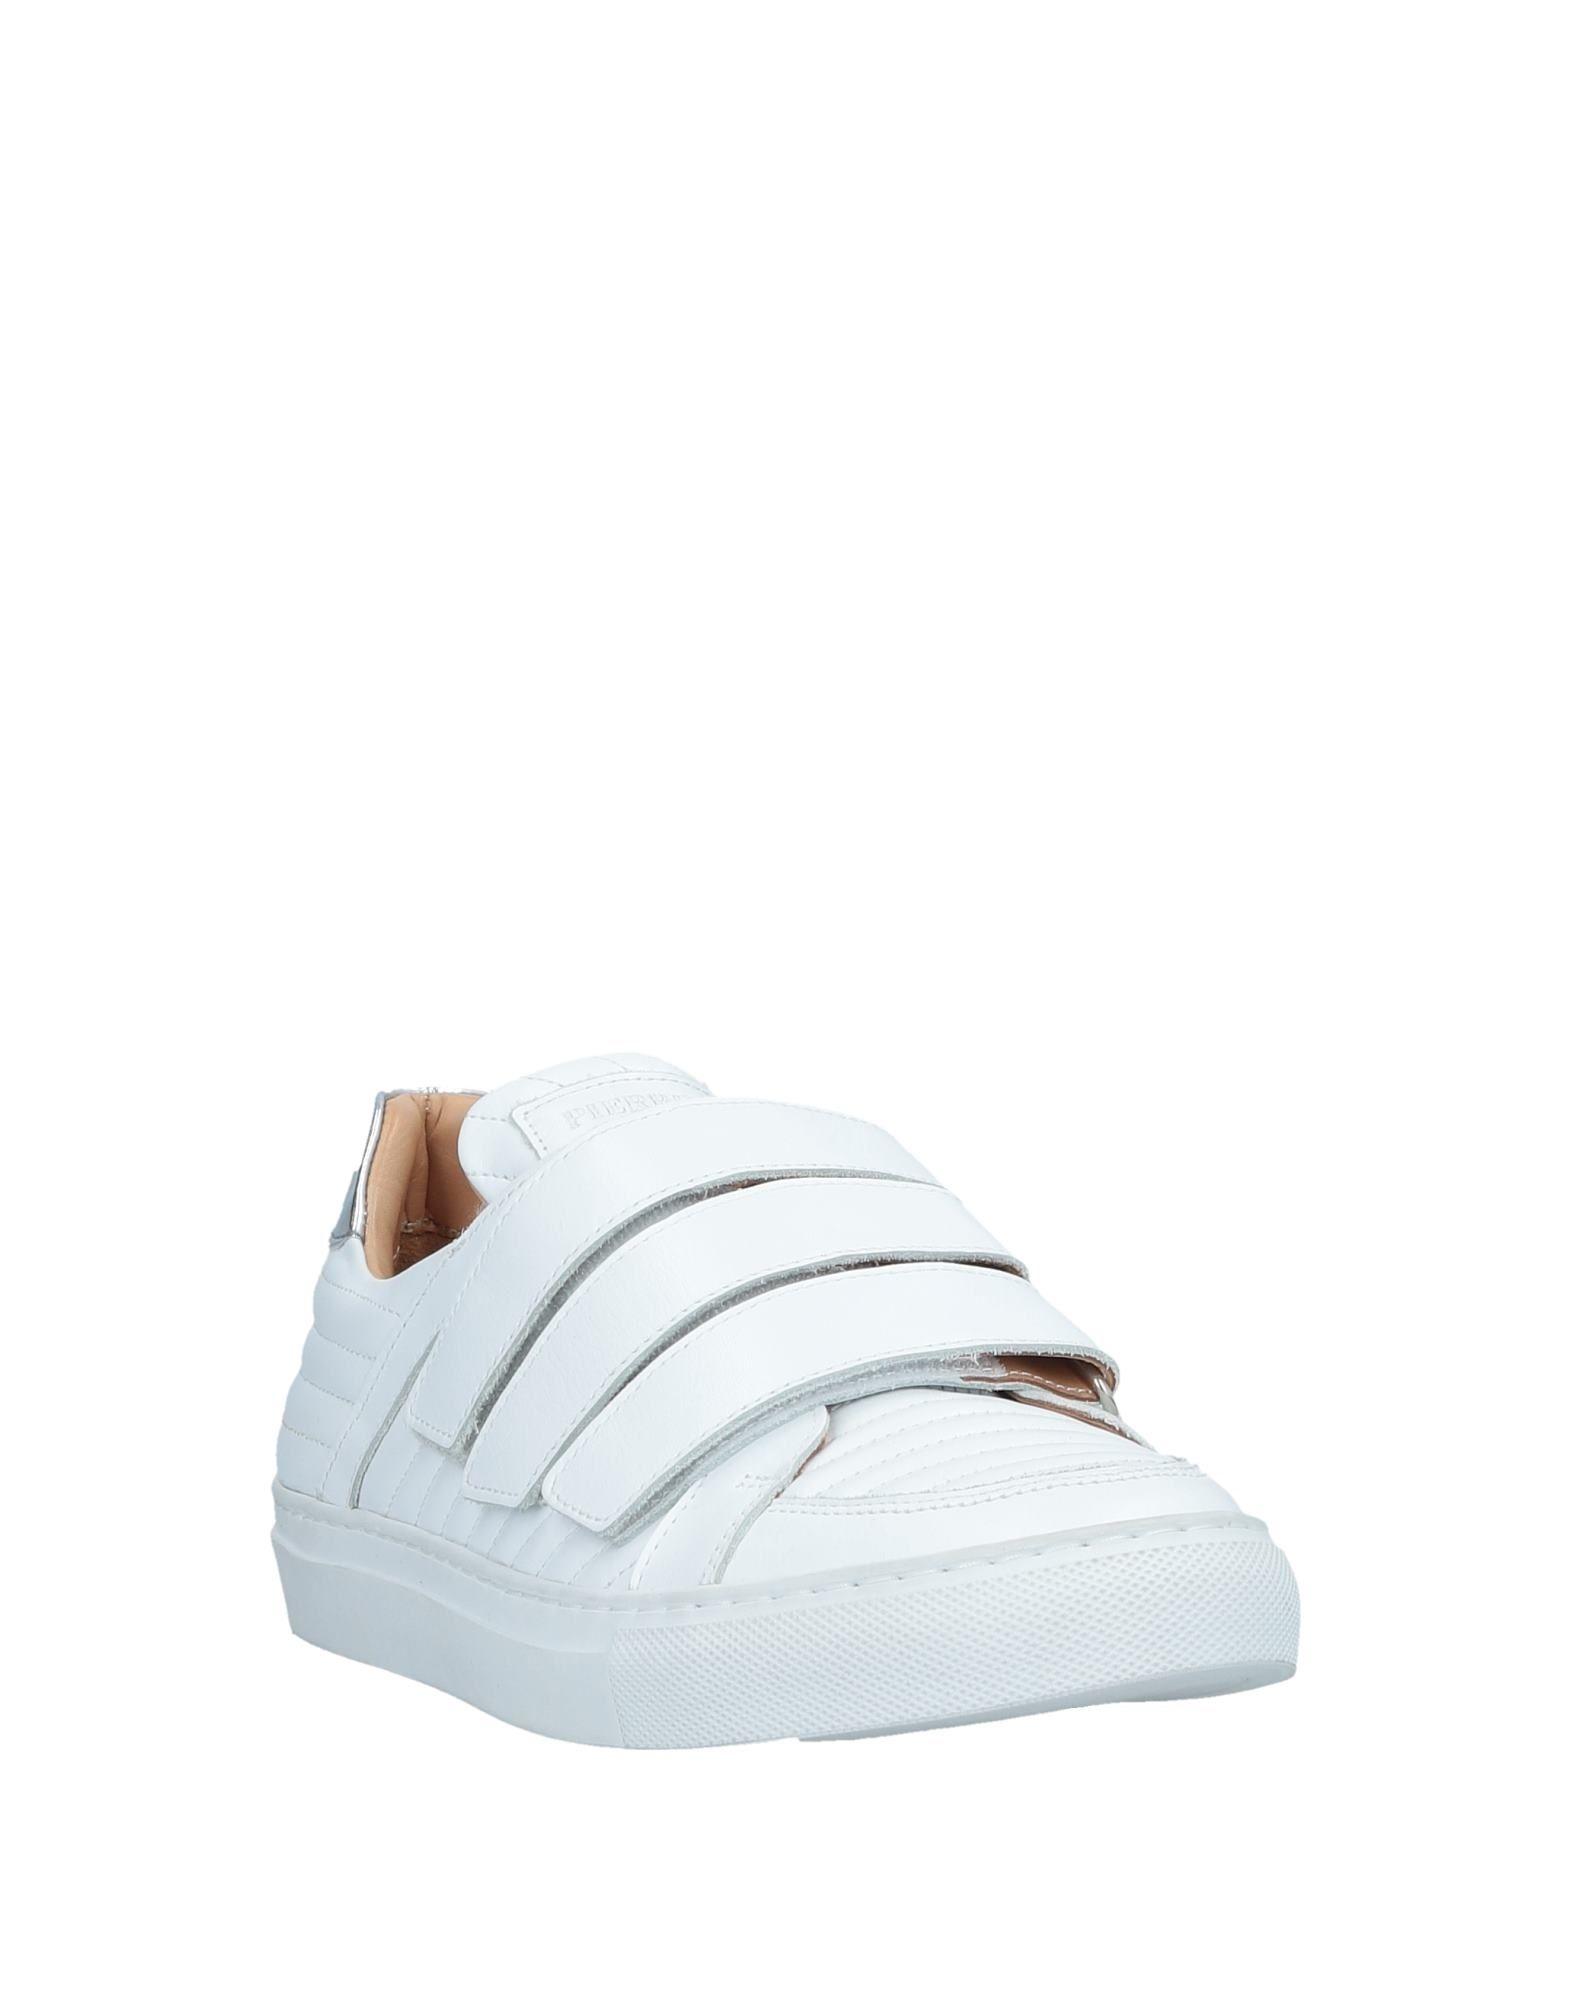 Pierre Balmain Sneakers Herren  11535038BX 11535038BX  39b480